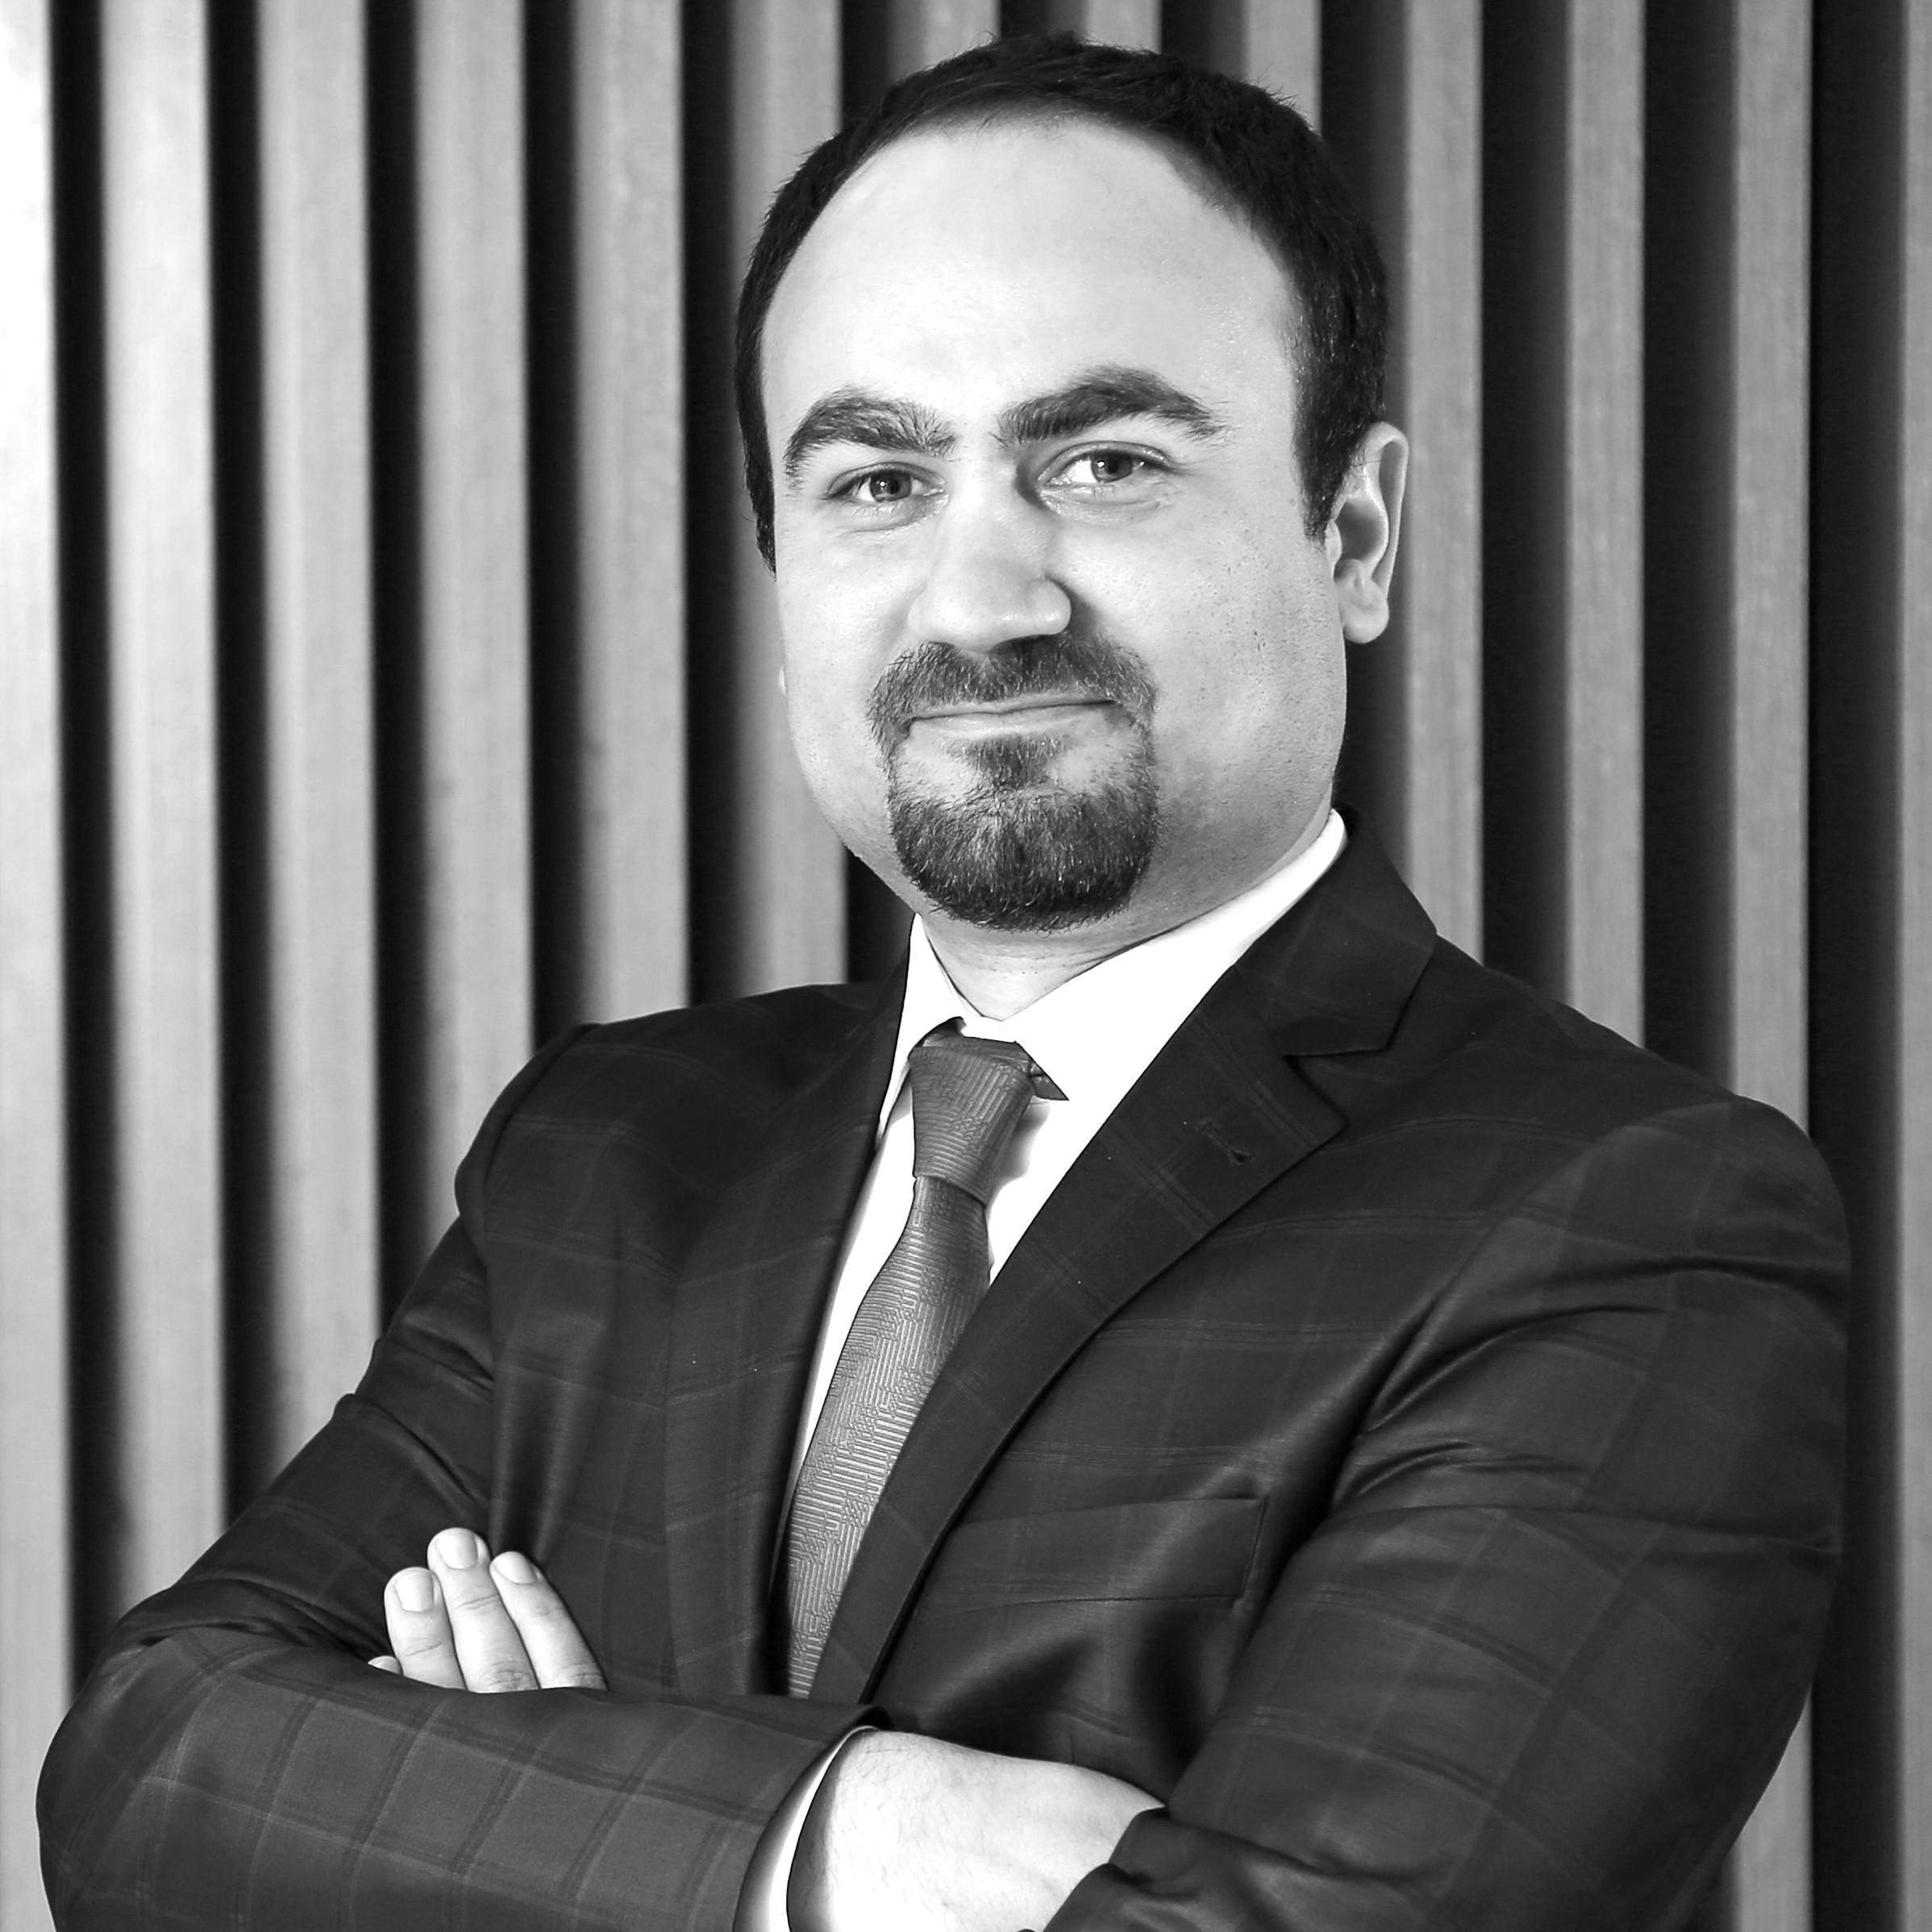 Mustafa Filizoğlu